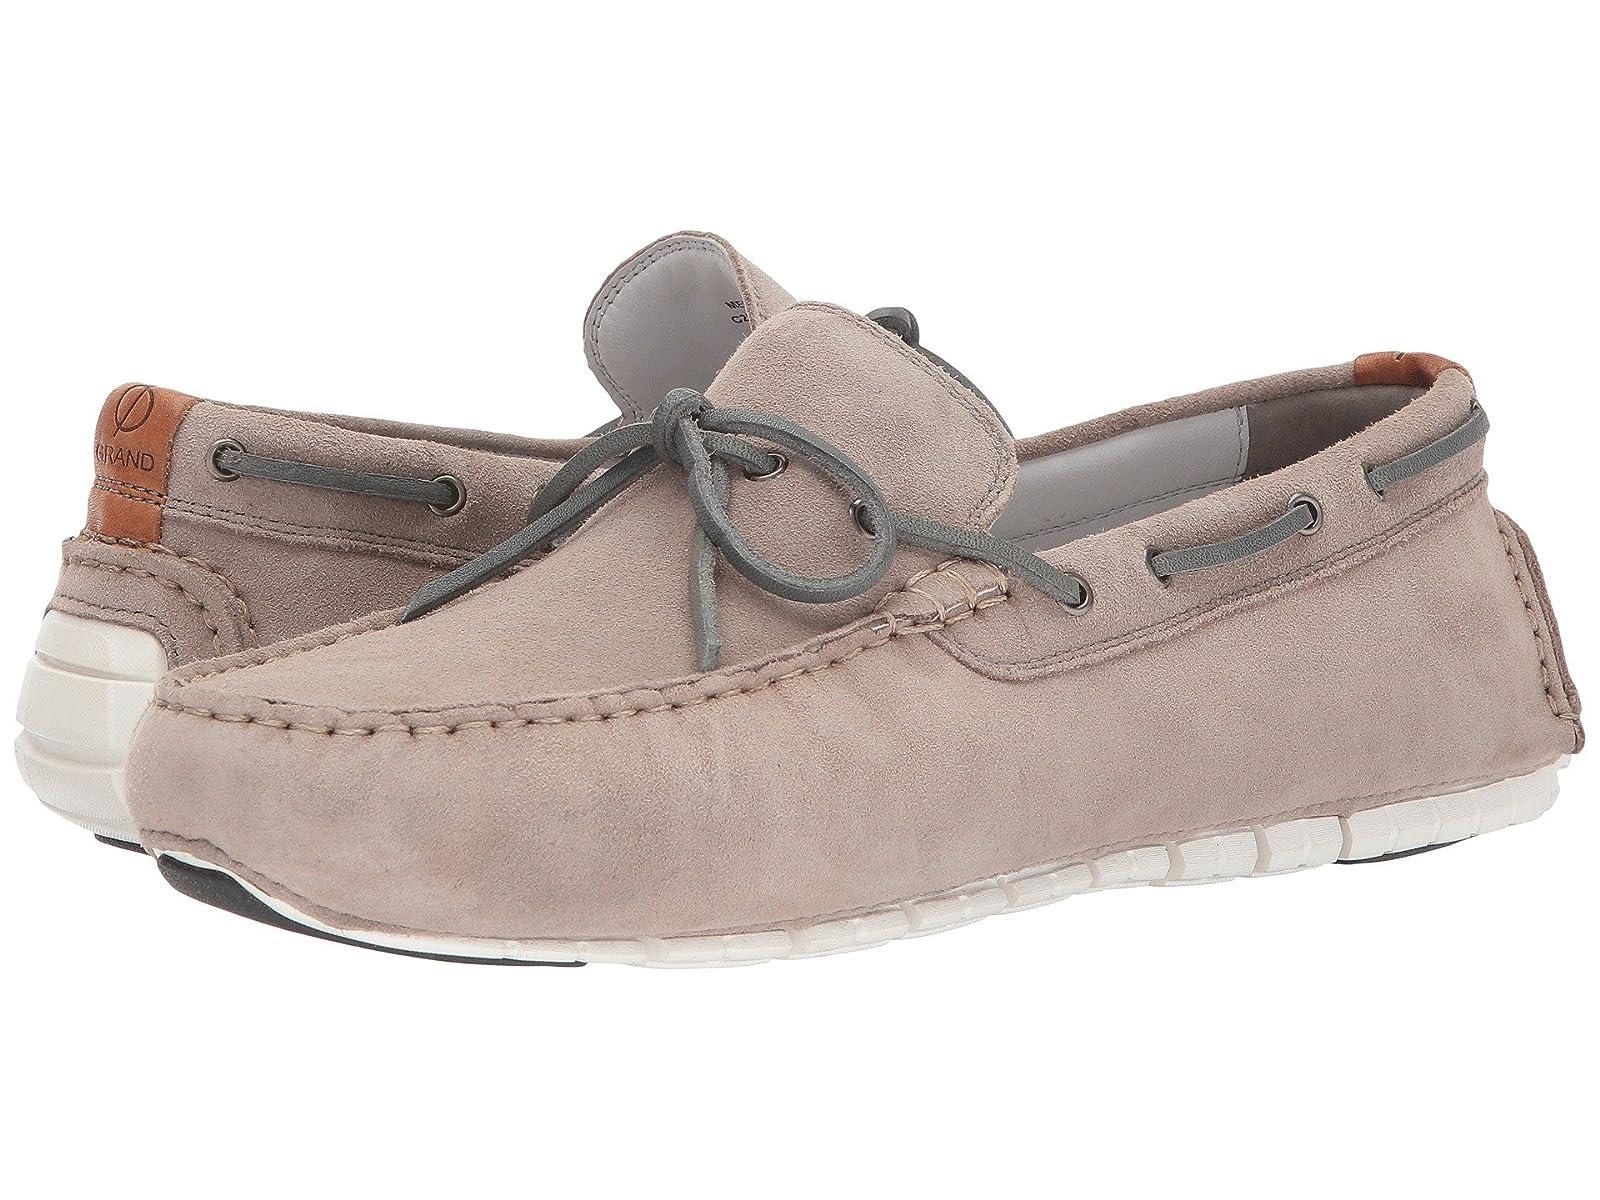 Cole Haan Zerogrand Camp Moc DriverCheap and distinctive eye-catching shoes